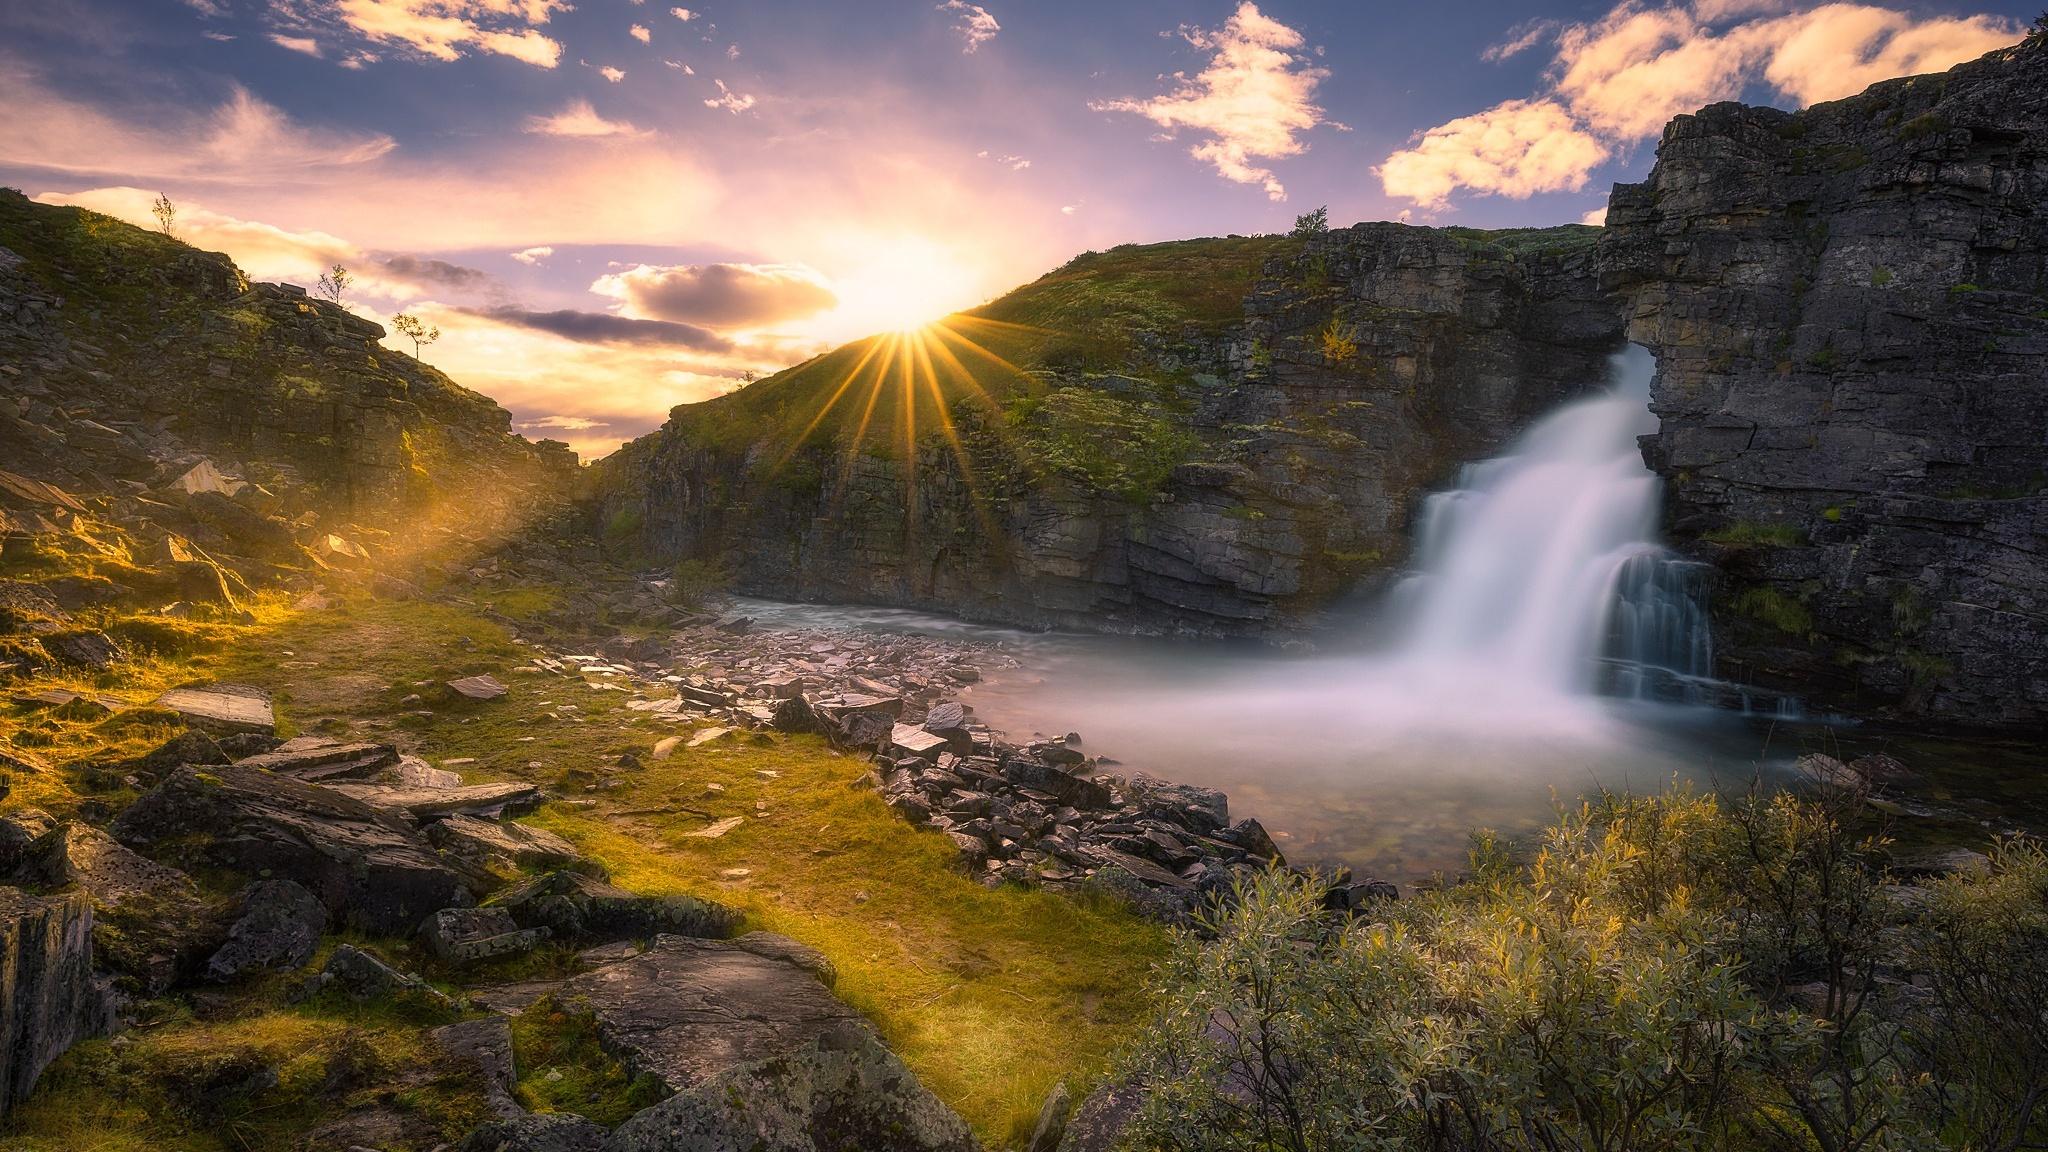 240x320 Niagara Falls Screensaver Free Wallpaper Download 2048x1152 Beautiful Waterfall And Sunrise 2048x1152